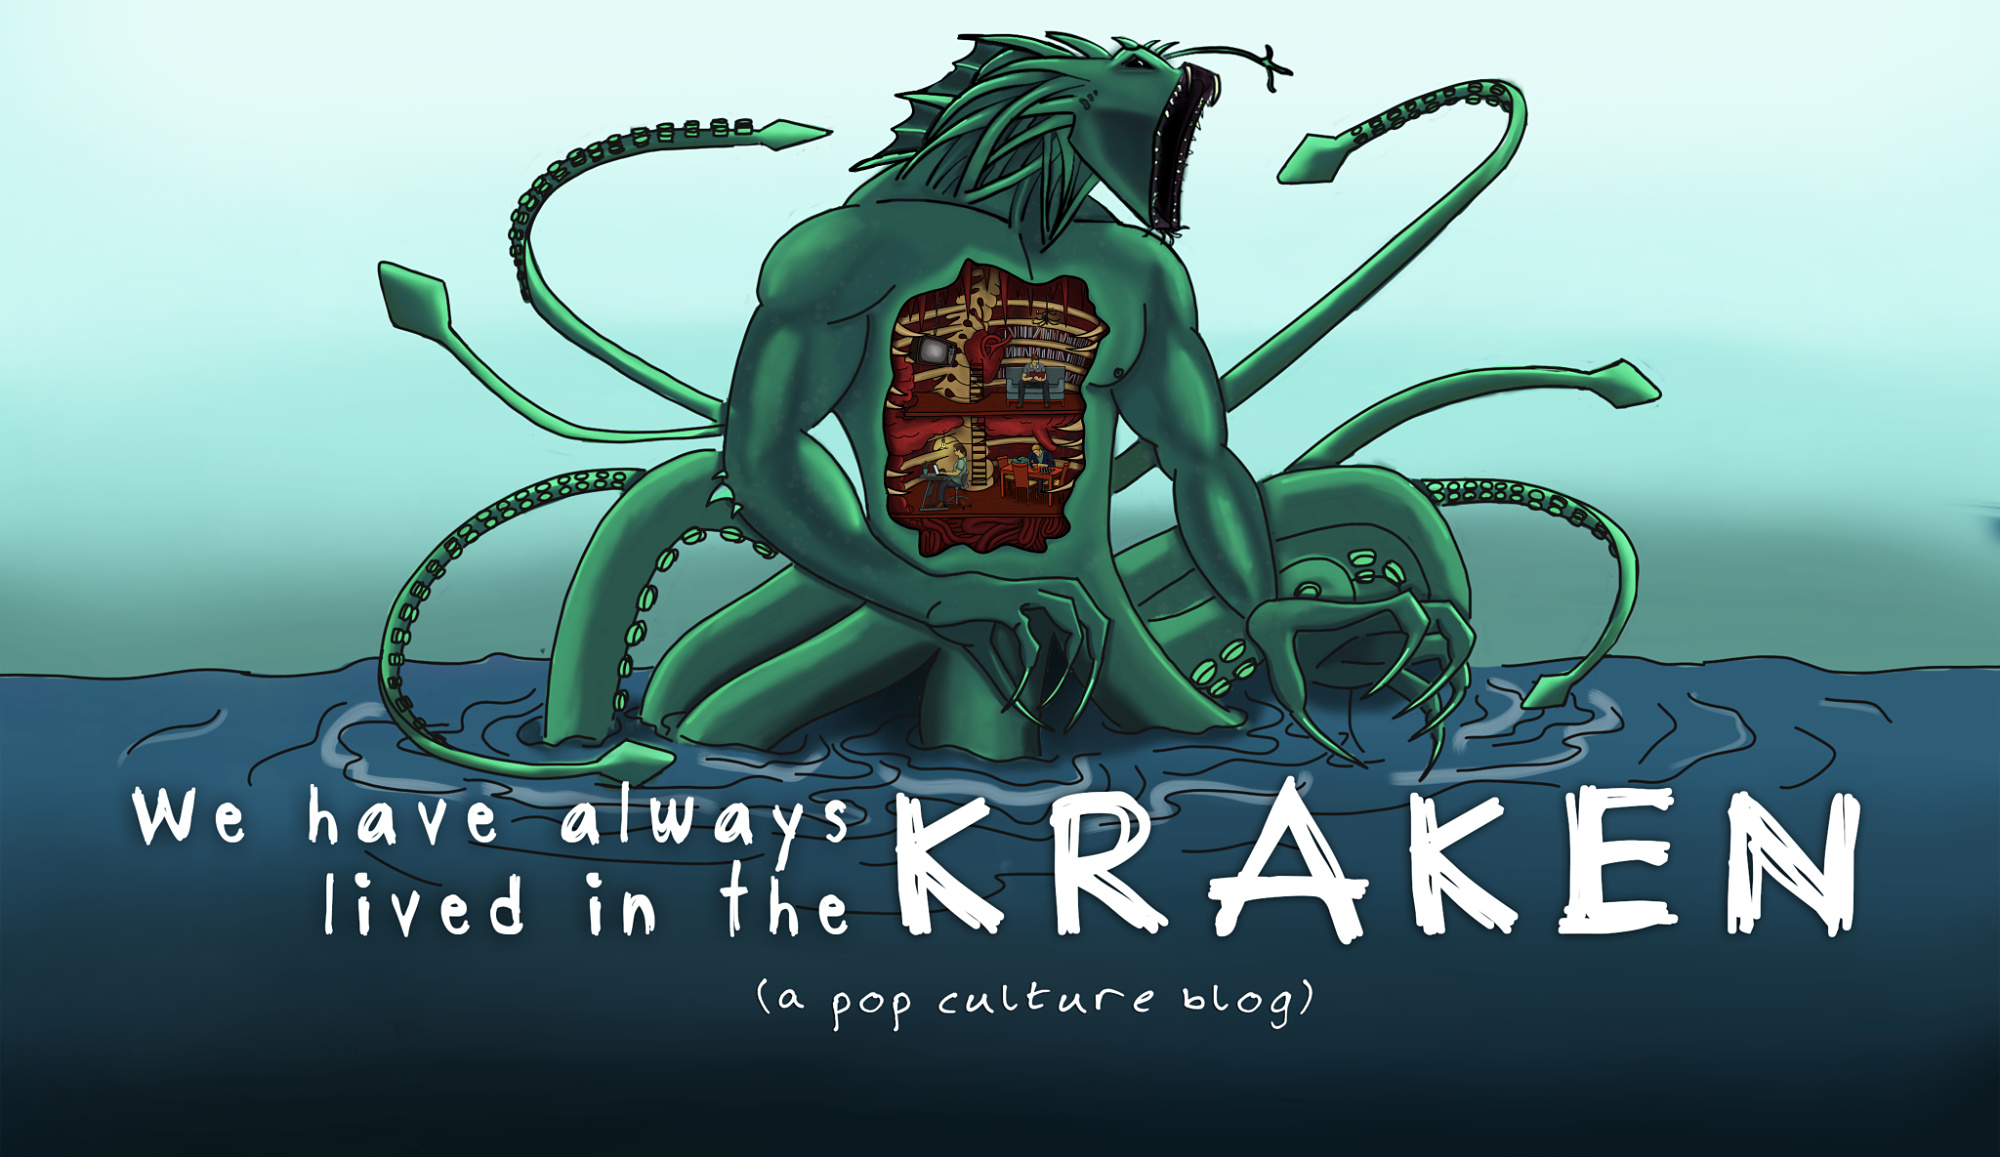 HQ Kraken Wallpapers | File 553.5Kb